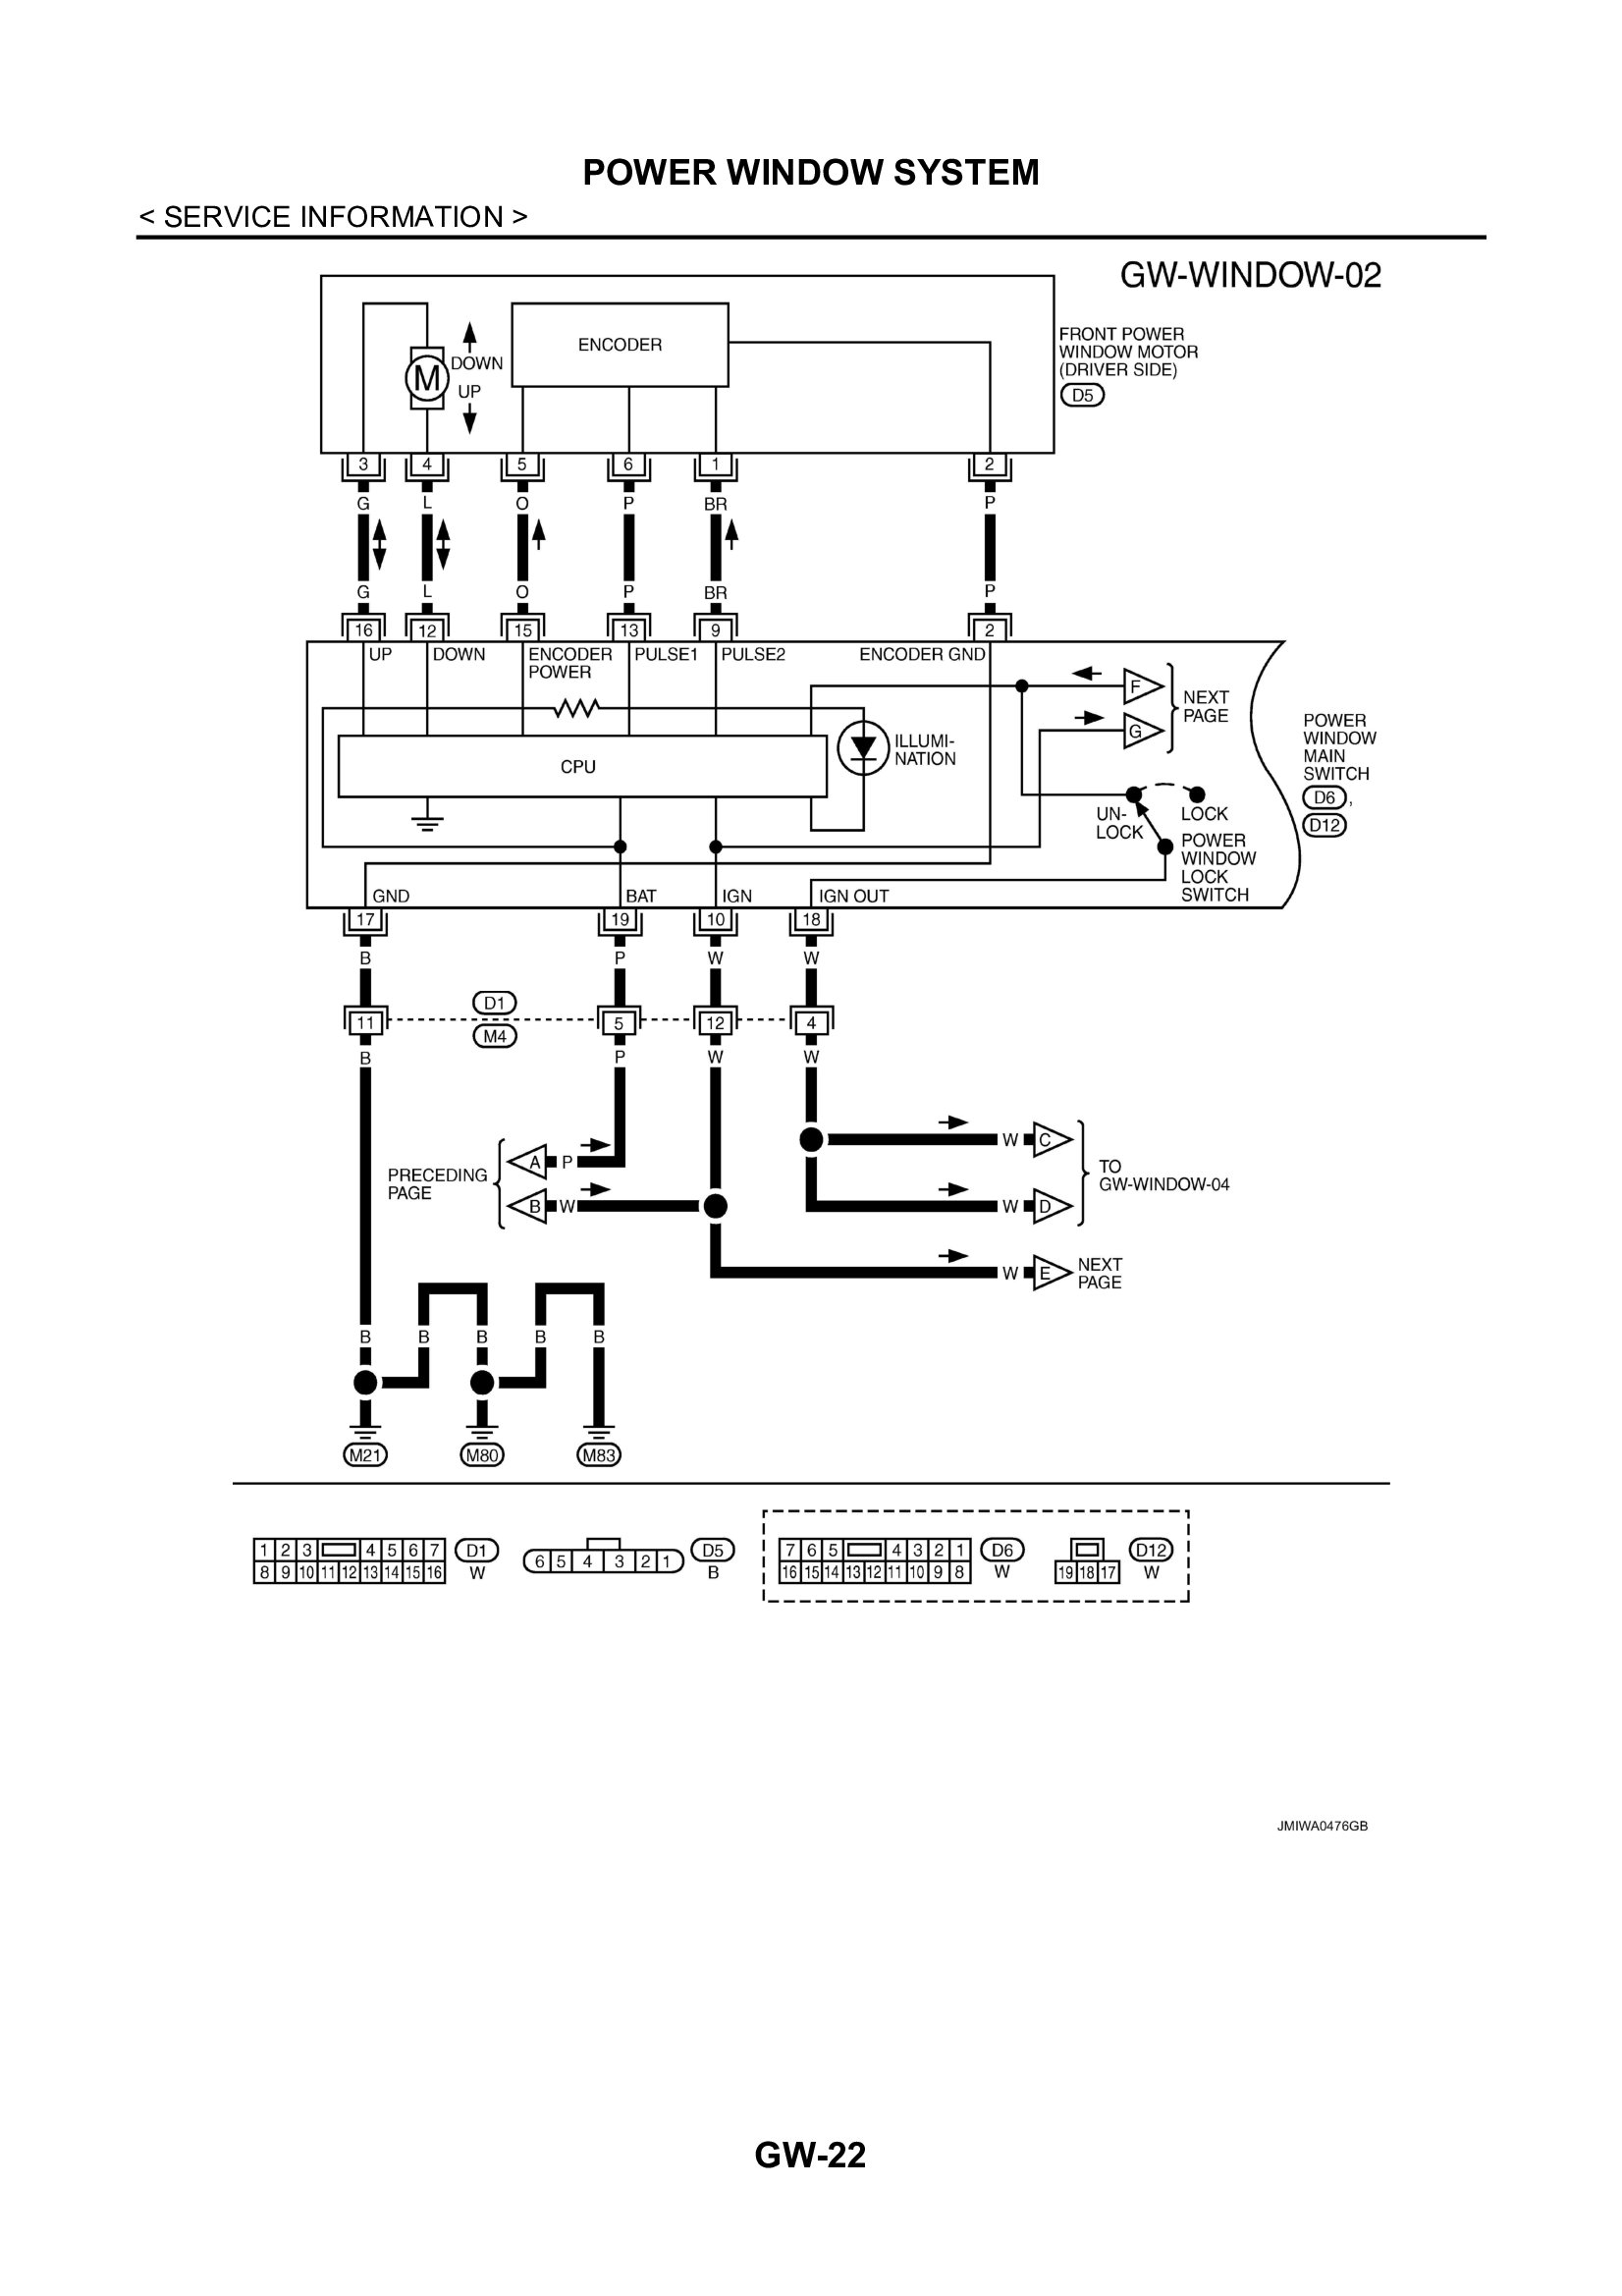 nissan navara d40 speaker wiring nissan image nissan navara d40 speaker wiring diagram wiring diagram on nissan navara d40 speaker wiring